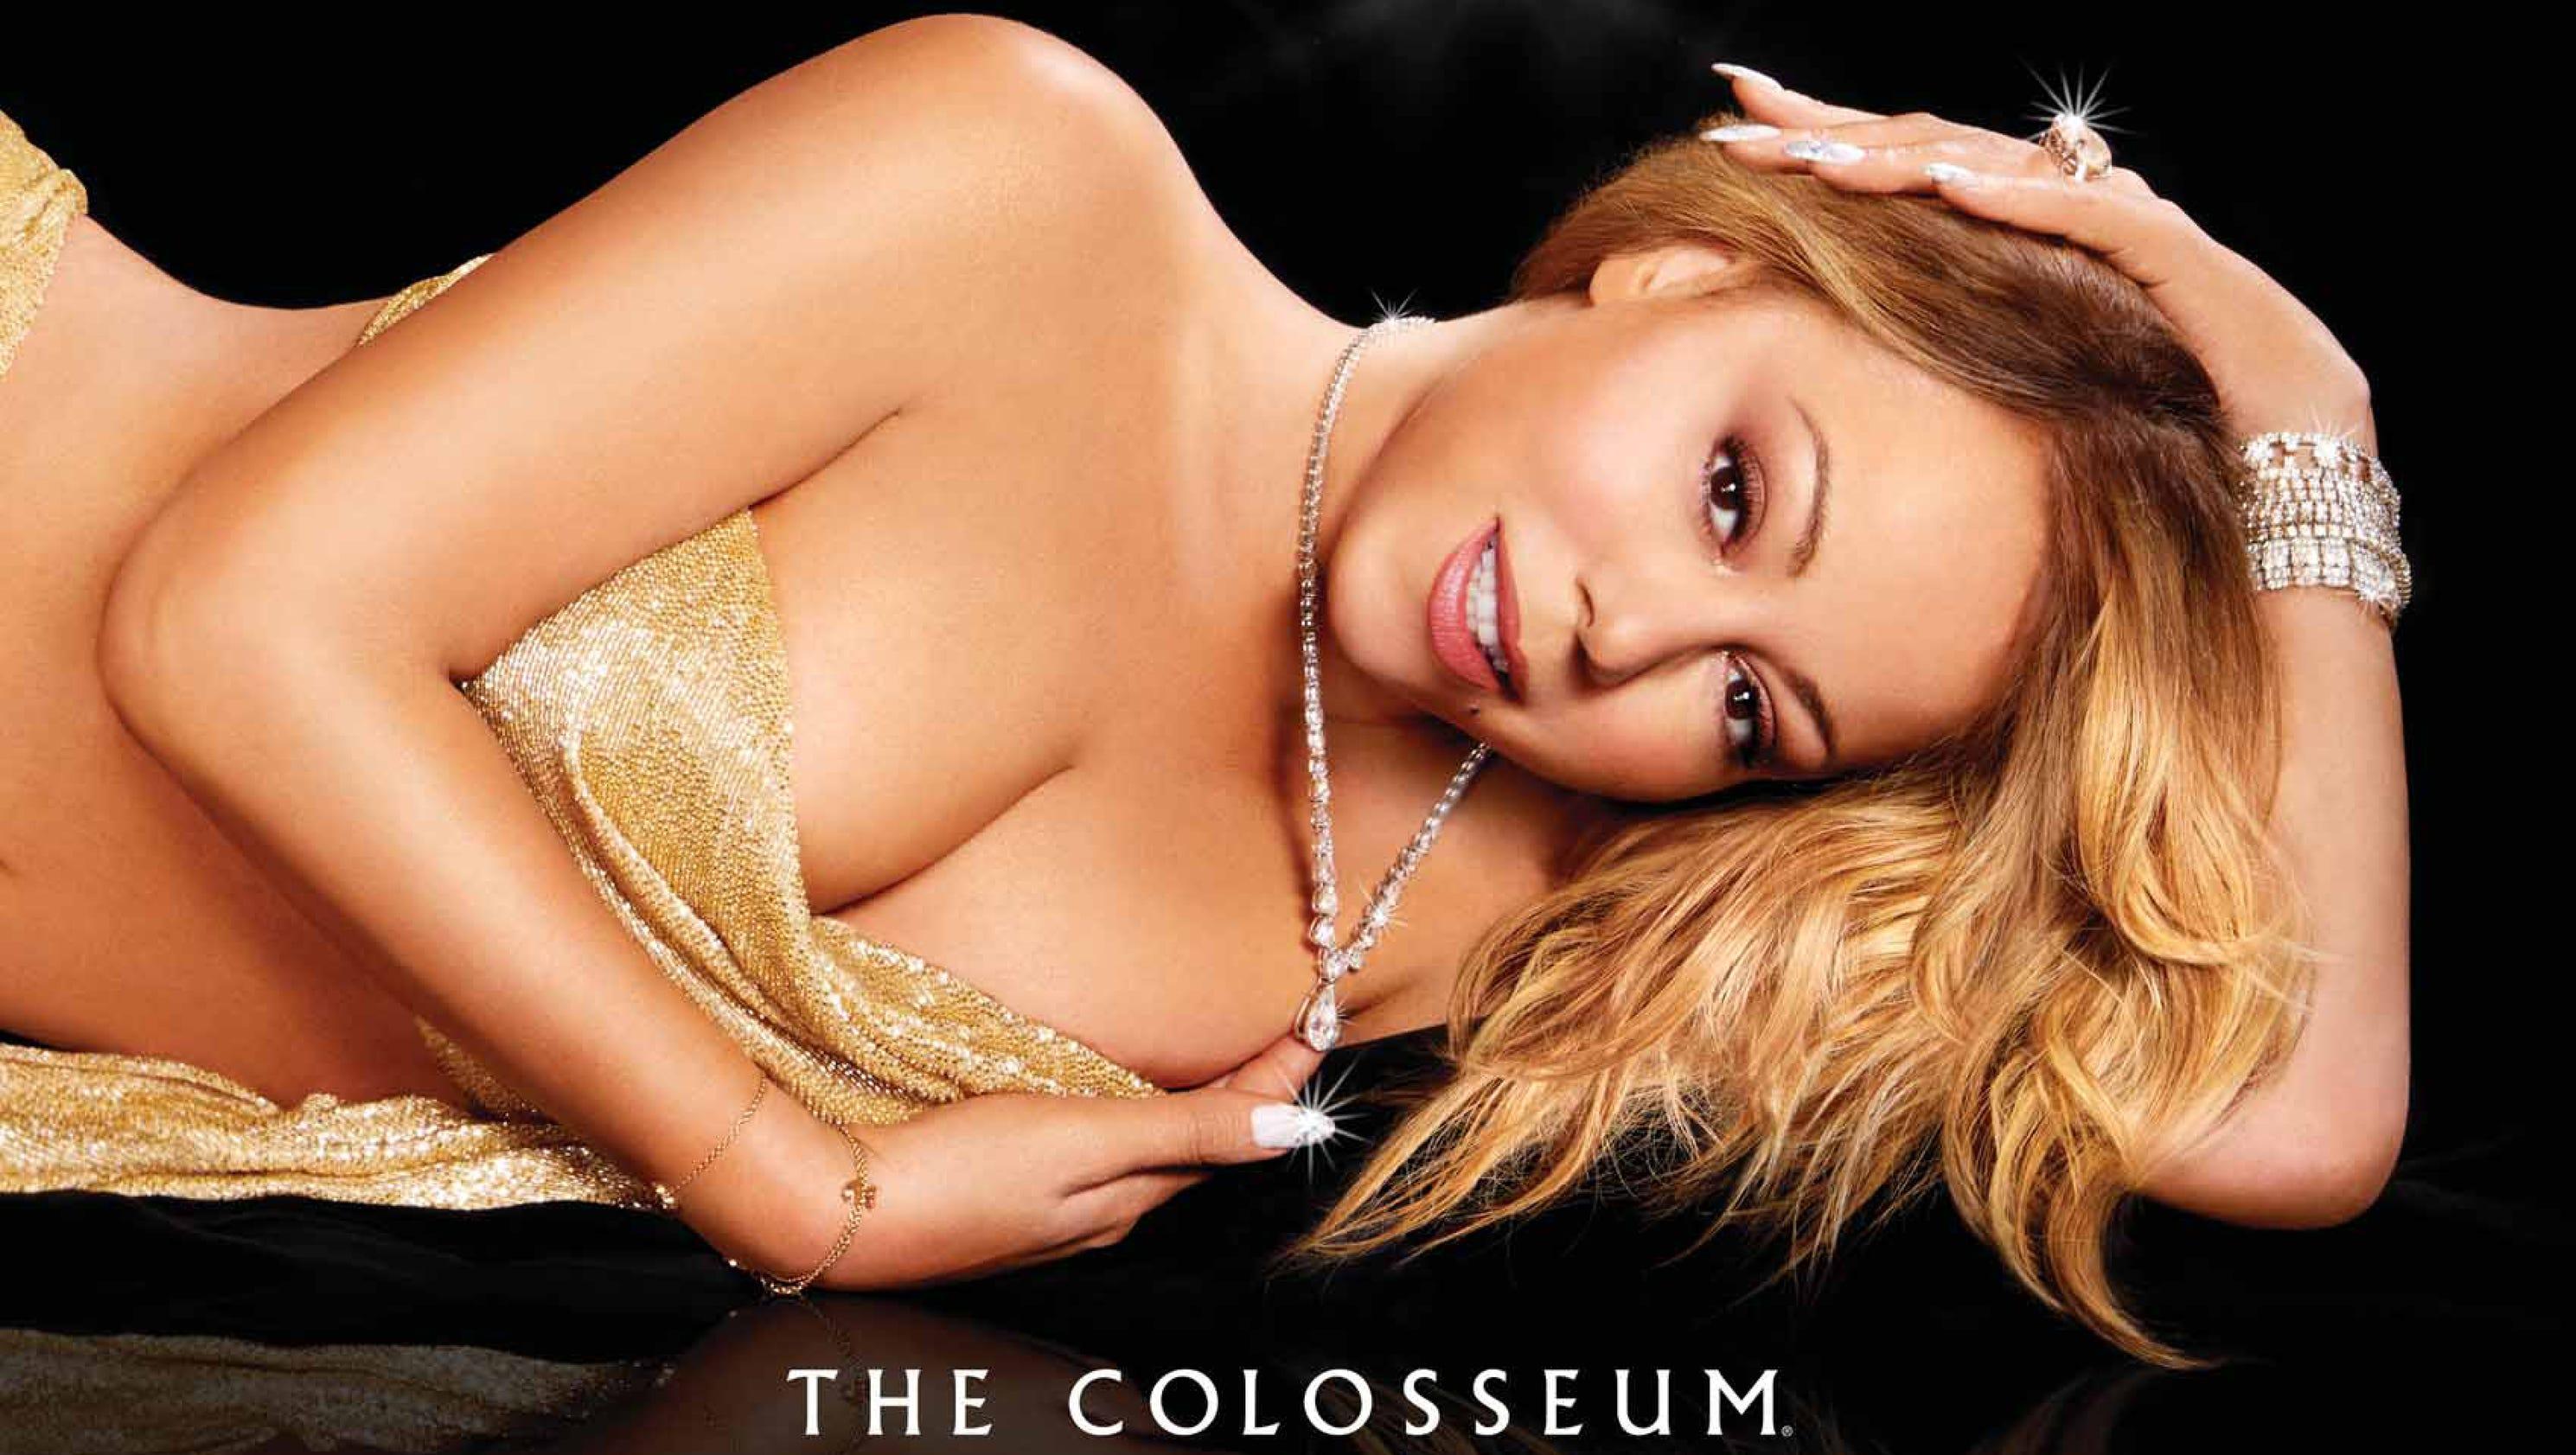 Too Sexy Mariah Carey Billboard Sparks Airport Drama